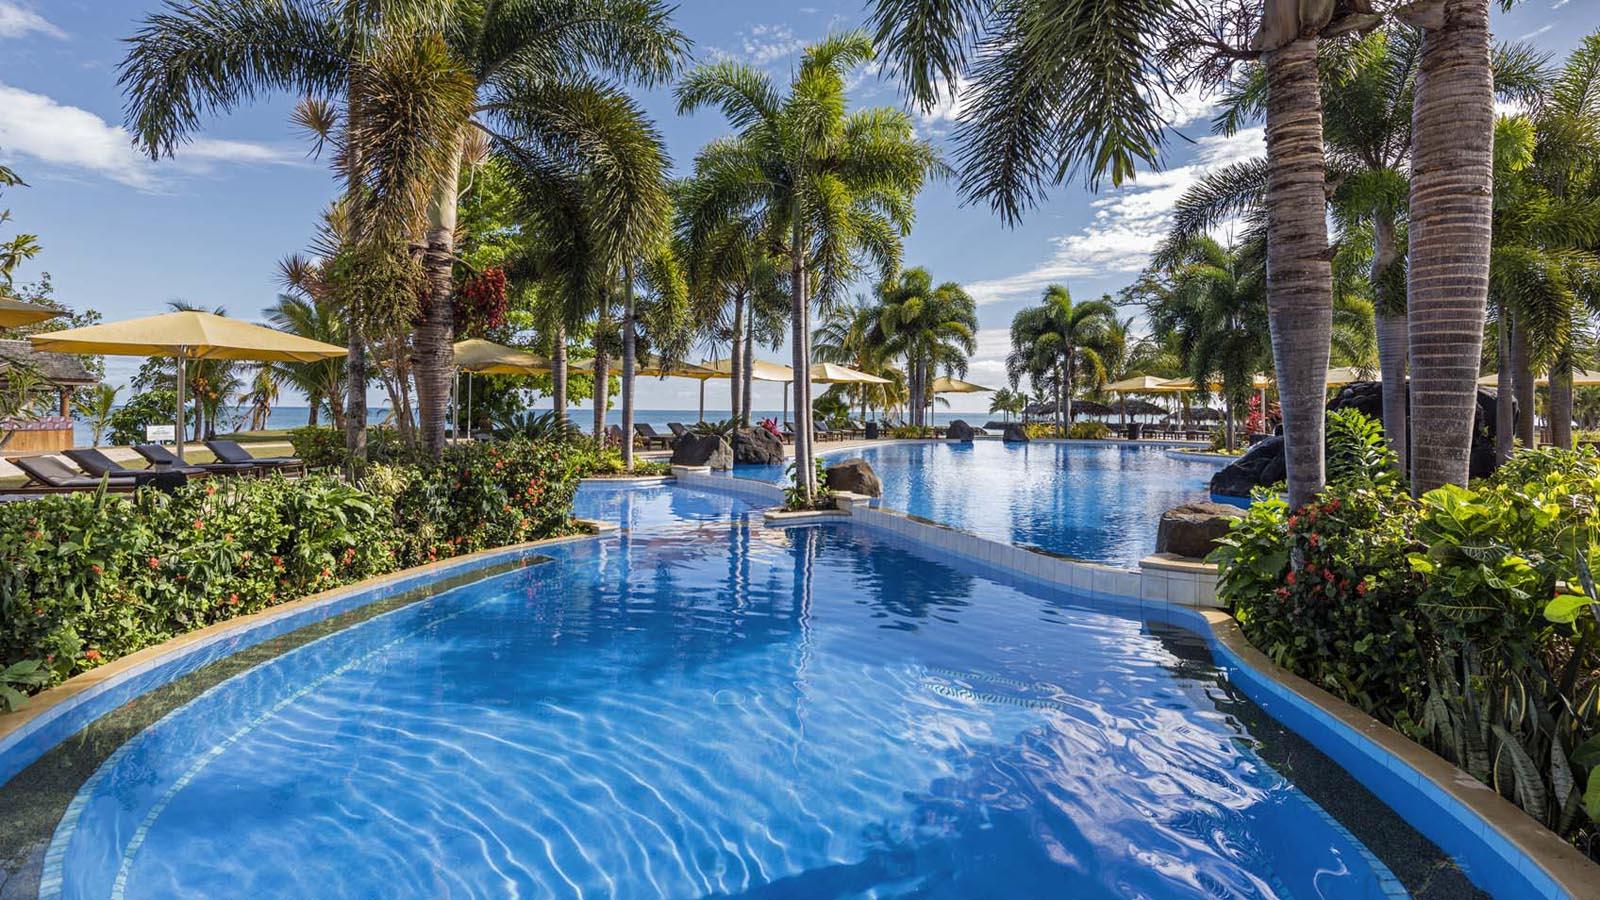 Aggie Grey's Lagoon Beach Resort & Spa